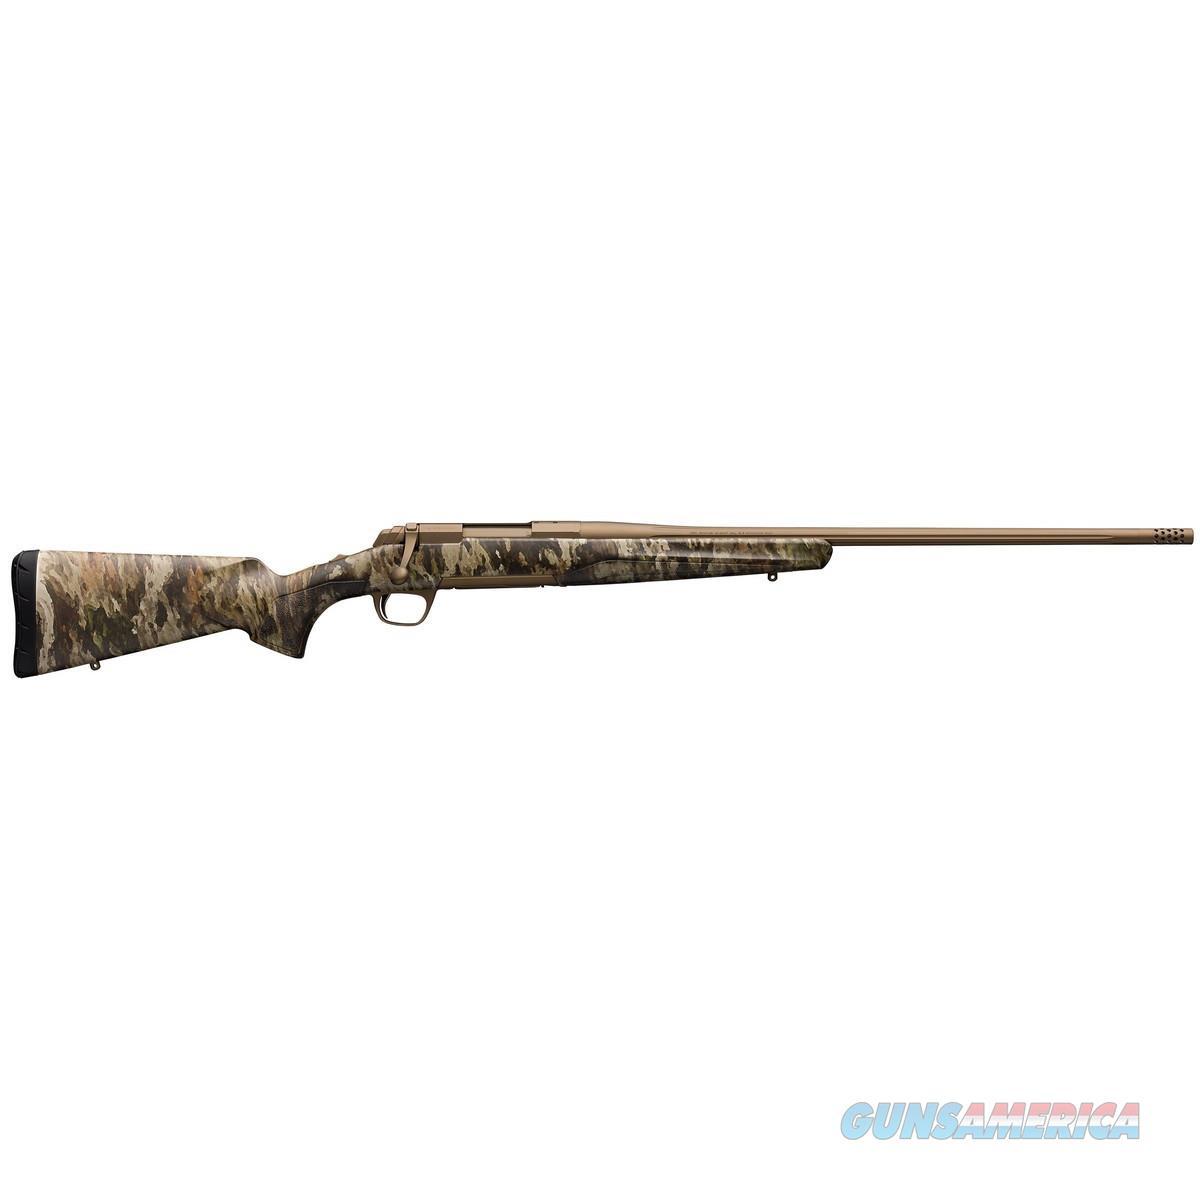 "Browning X-Bolt Hell's Canyon SPEED .308 Win 22"" A-TACS TD-X 035494218   Guns > Rifles > Browning Rifles > Bolt Action > Hunting > Blue"